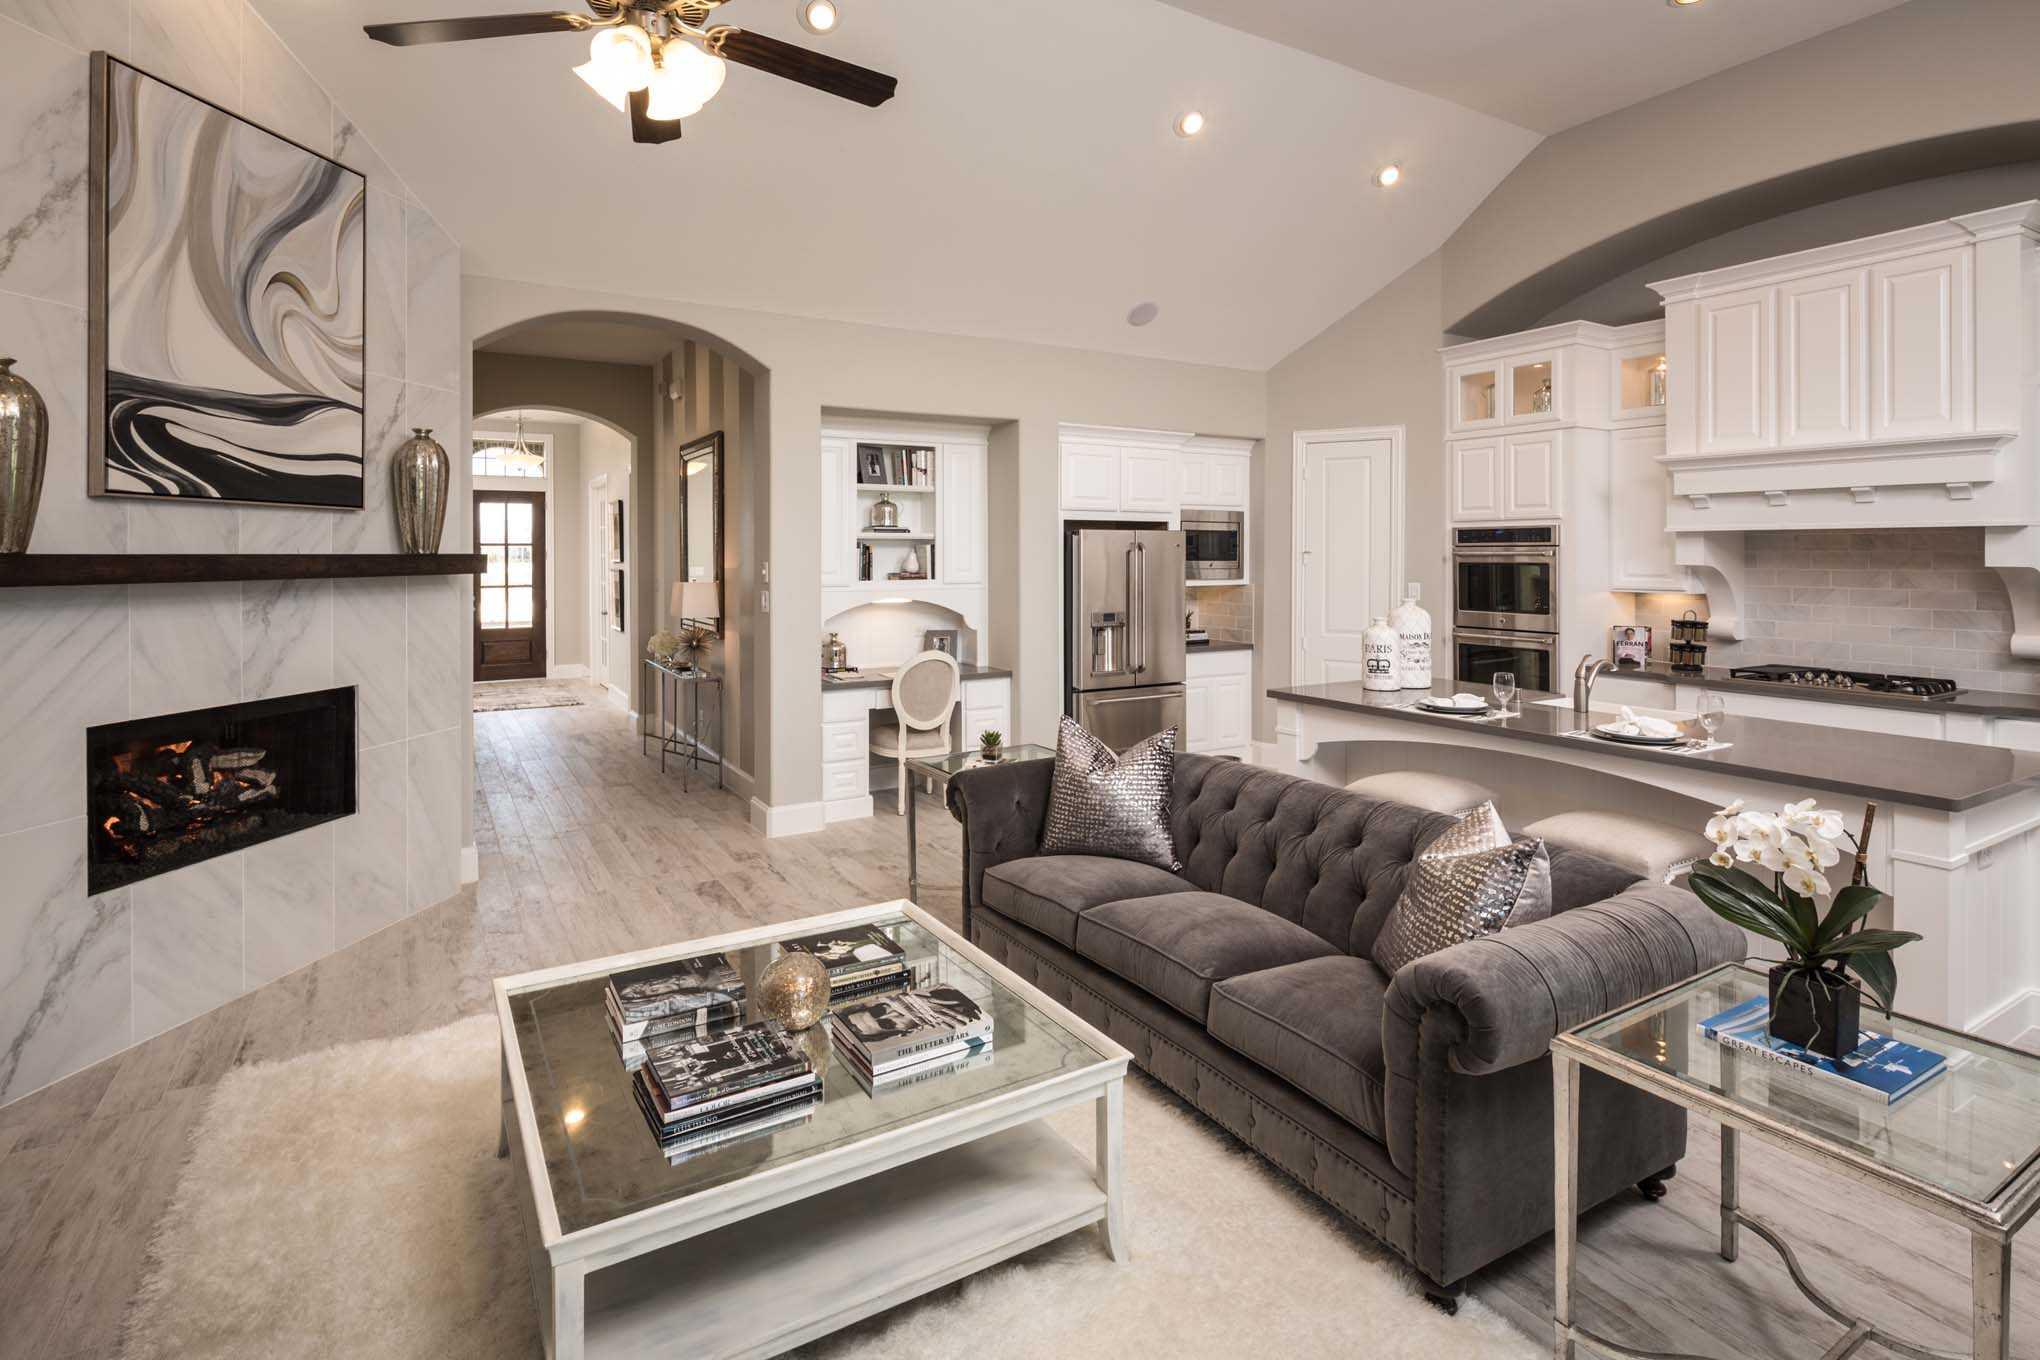 Representative Photo   family room. Model Home in Houston Texas  Cinco Ranch 70s community